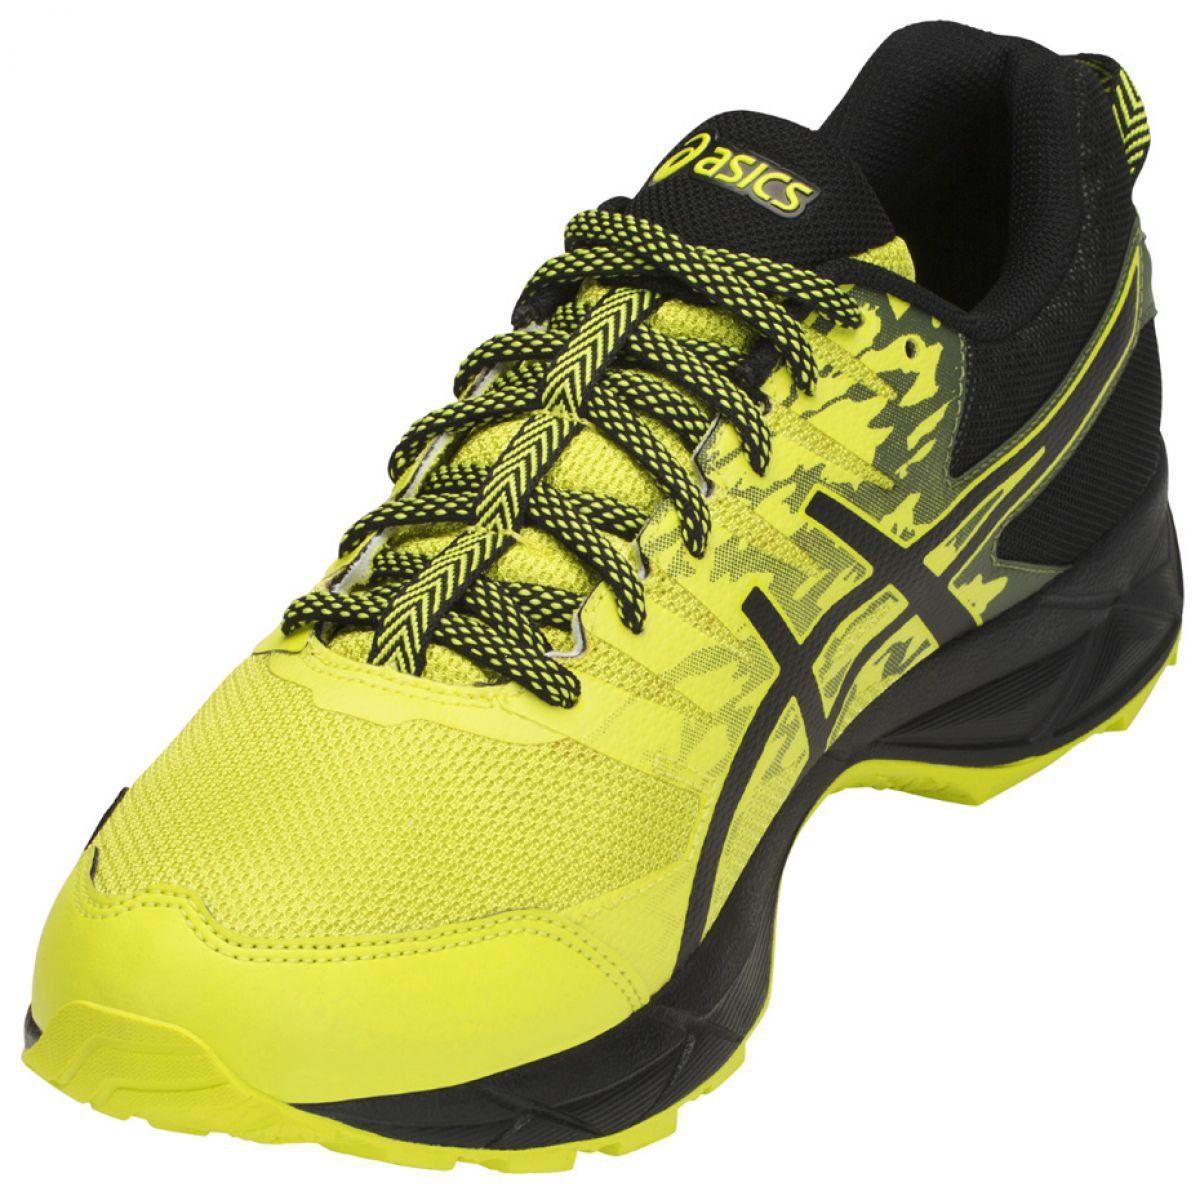 Buty Do Biegania Asics Gel Sonoma 3 M Gtx T727n 8990 Czarne Zolte Black Running Shoes Running Shoes Running Shoes For Men